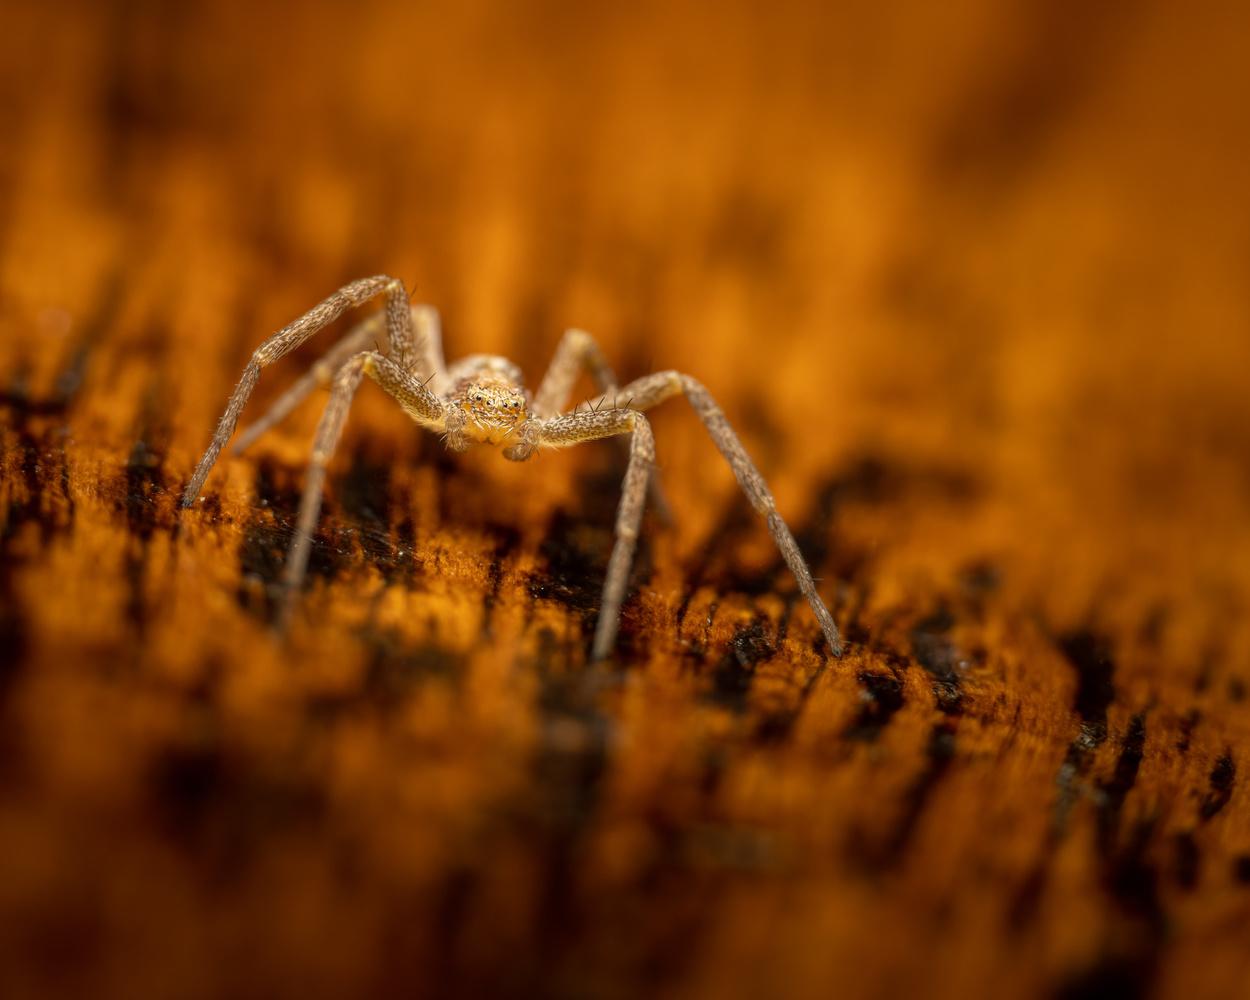 Spider by Skyler Ewing